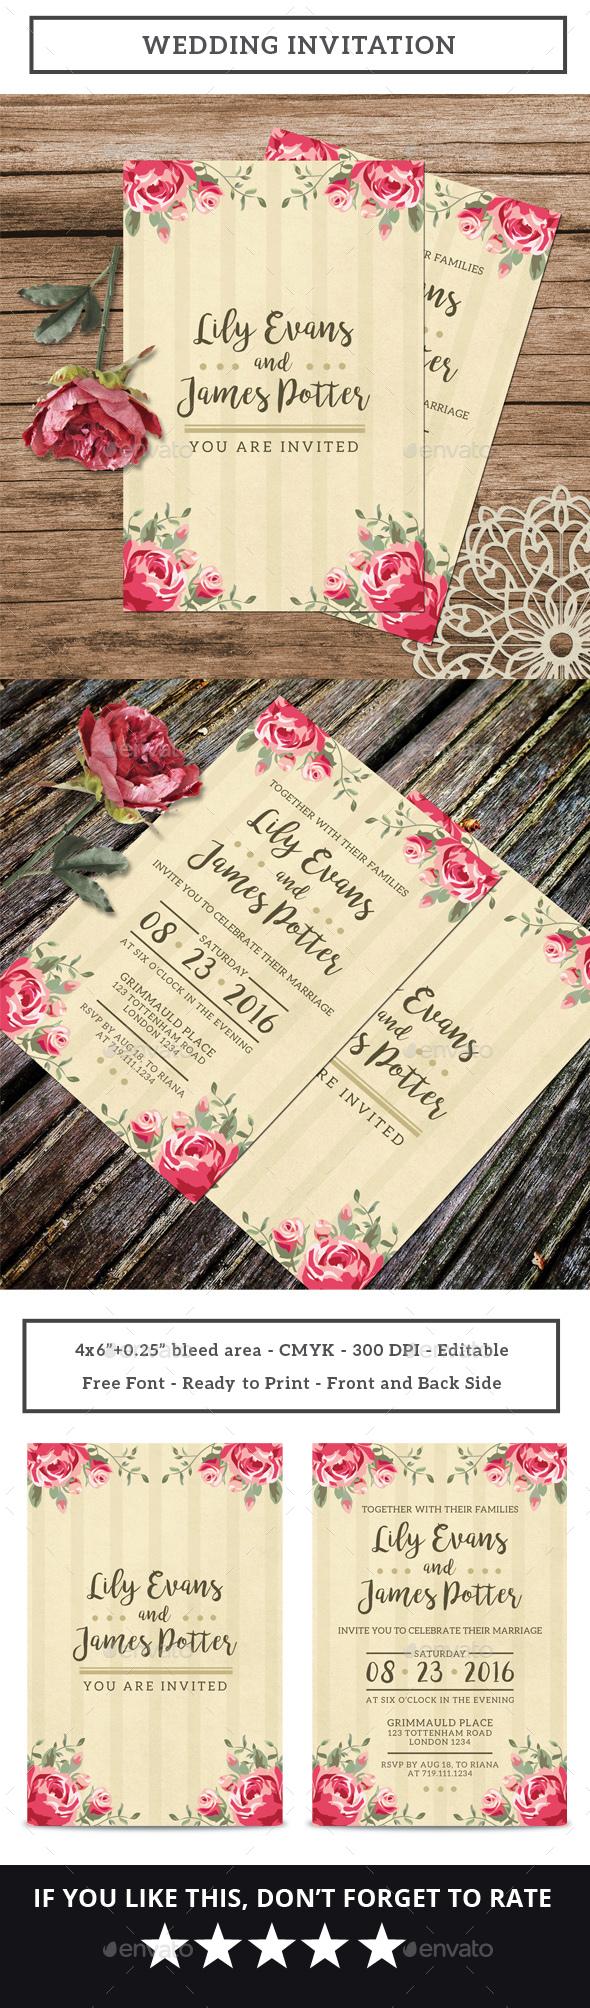 Wedding Invitation Vol.3